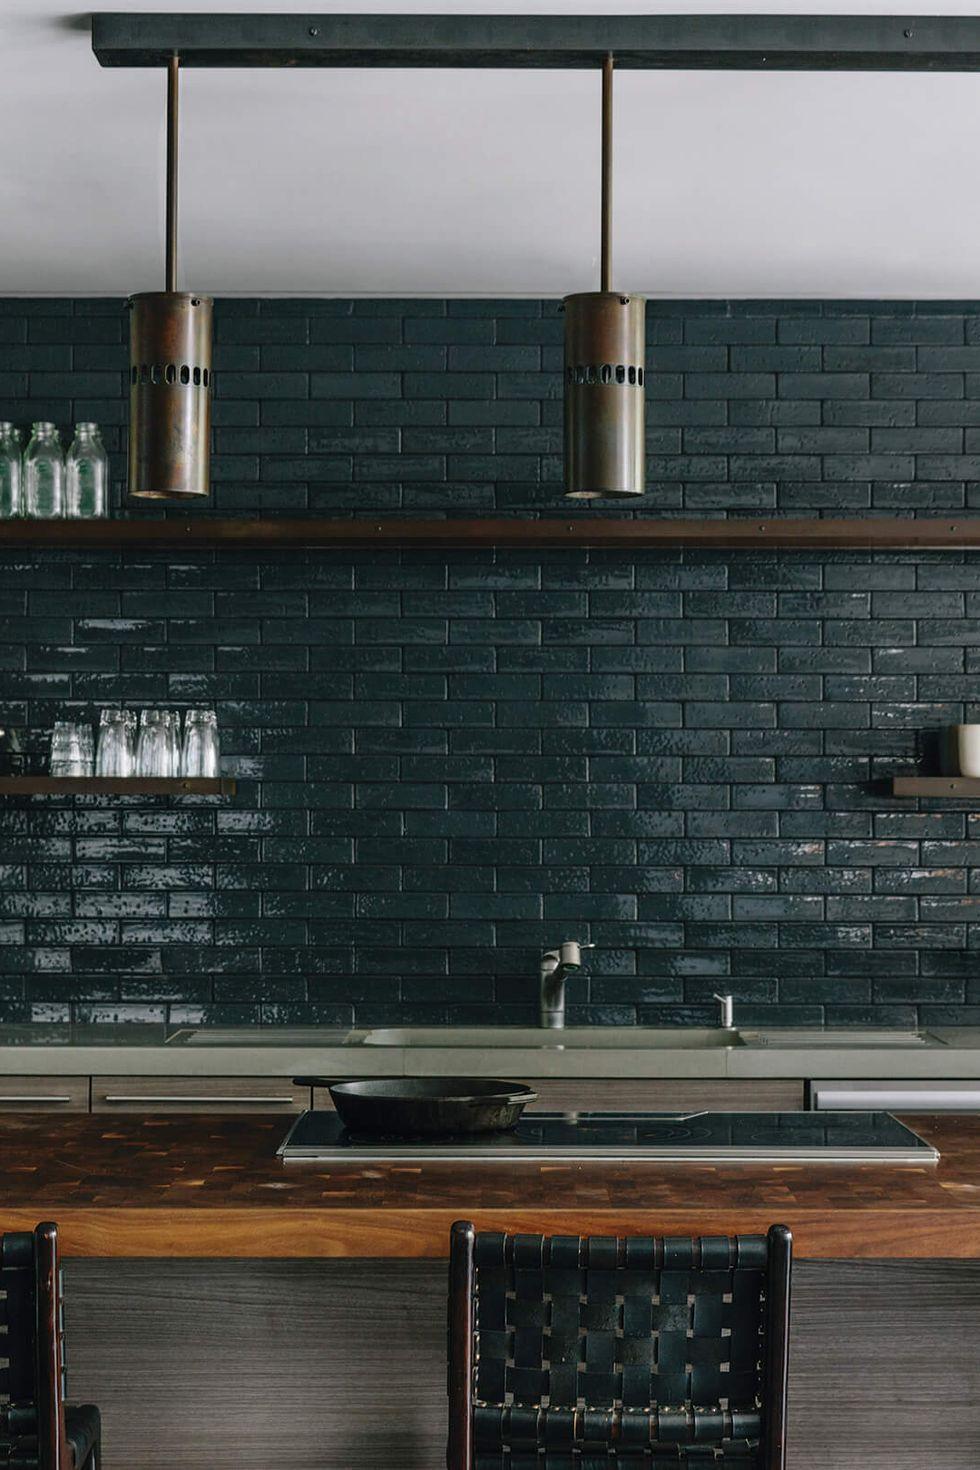 modern kitchen design featuring emerald green subway tile backsplash, minimalist style, large center island and open shelving